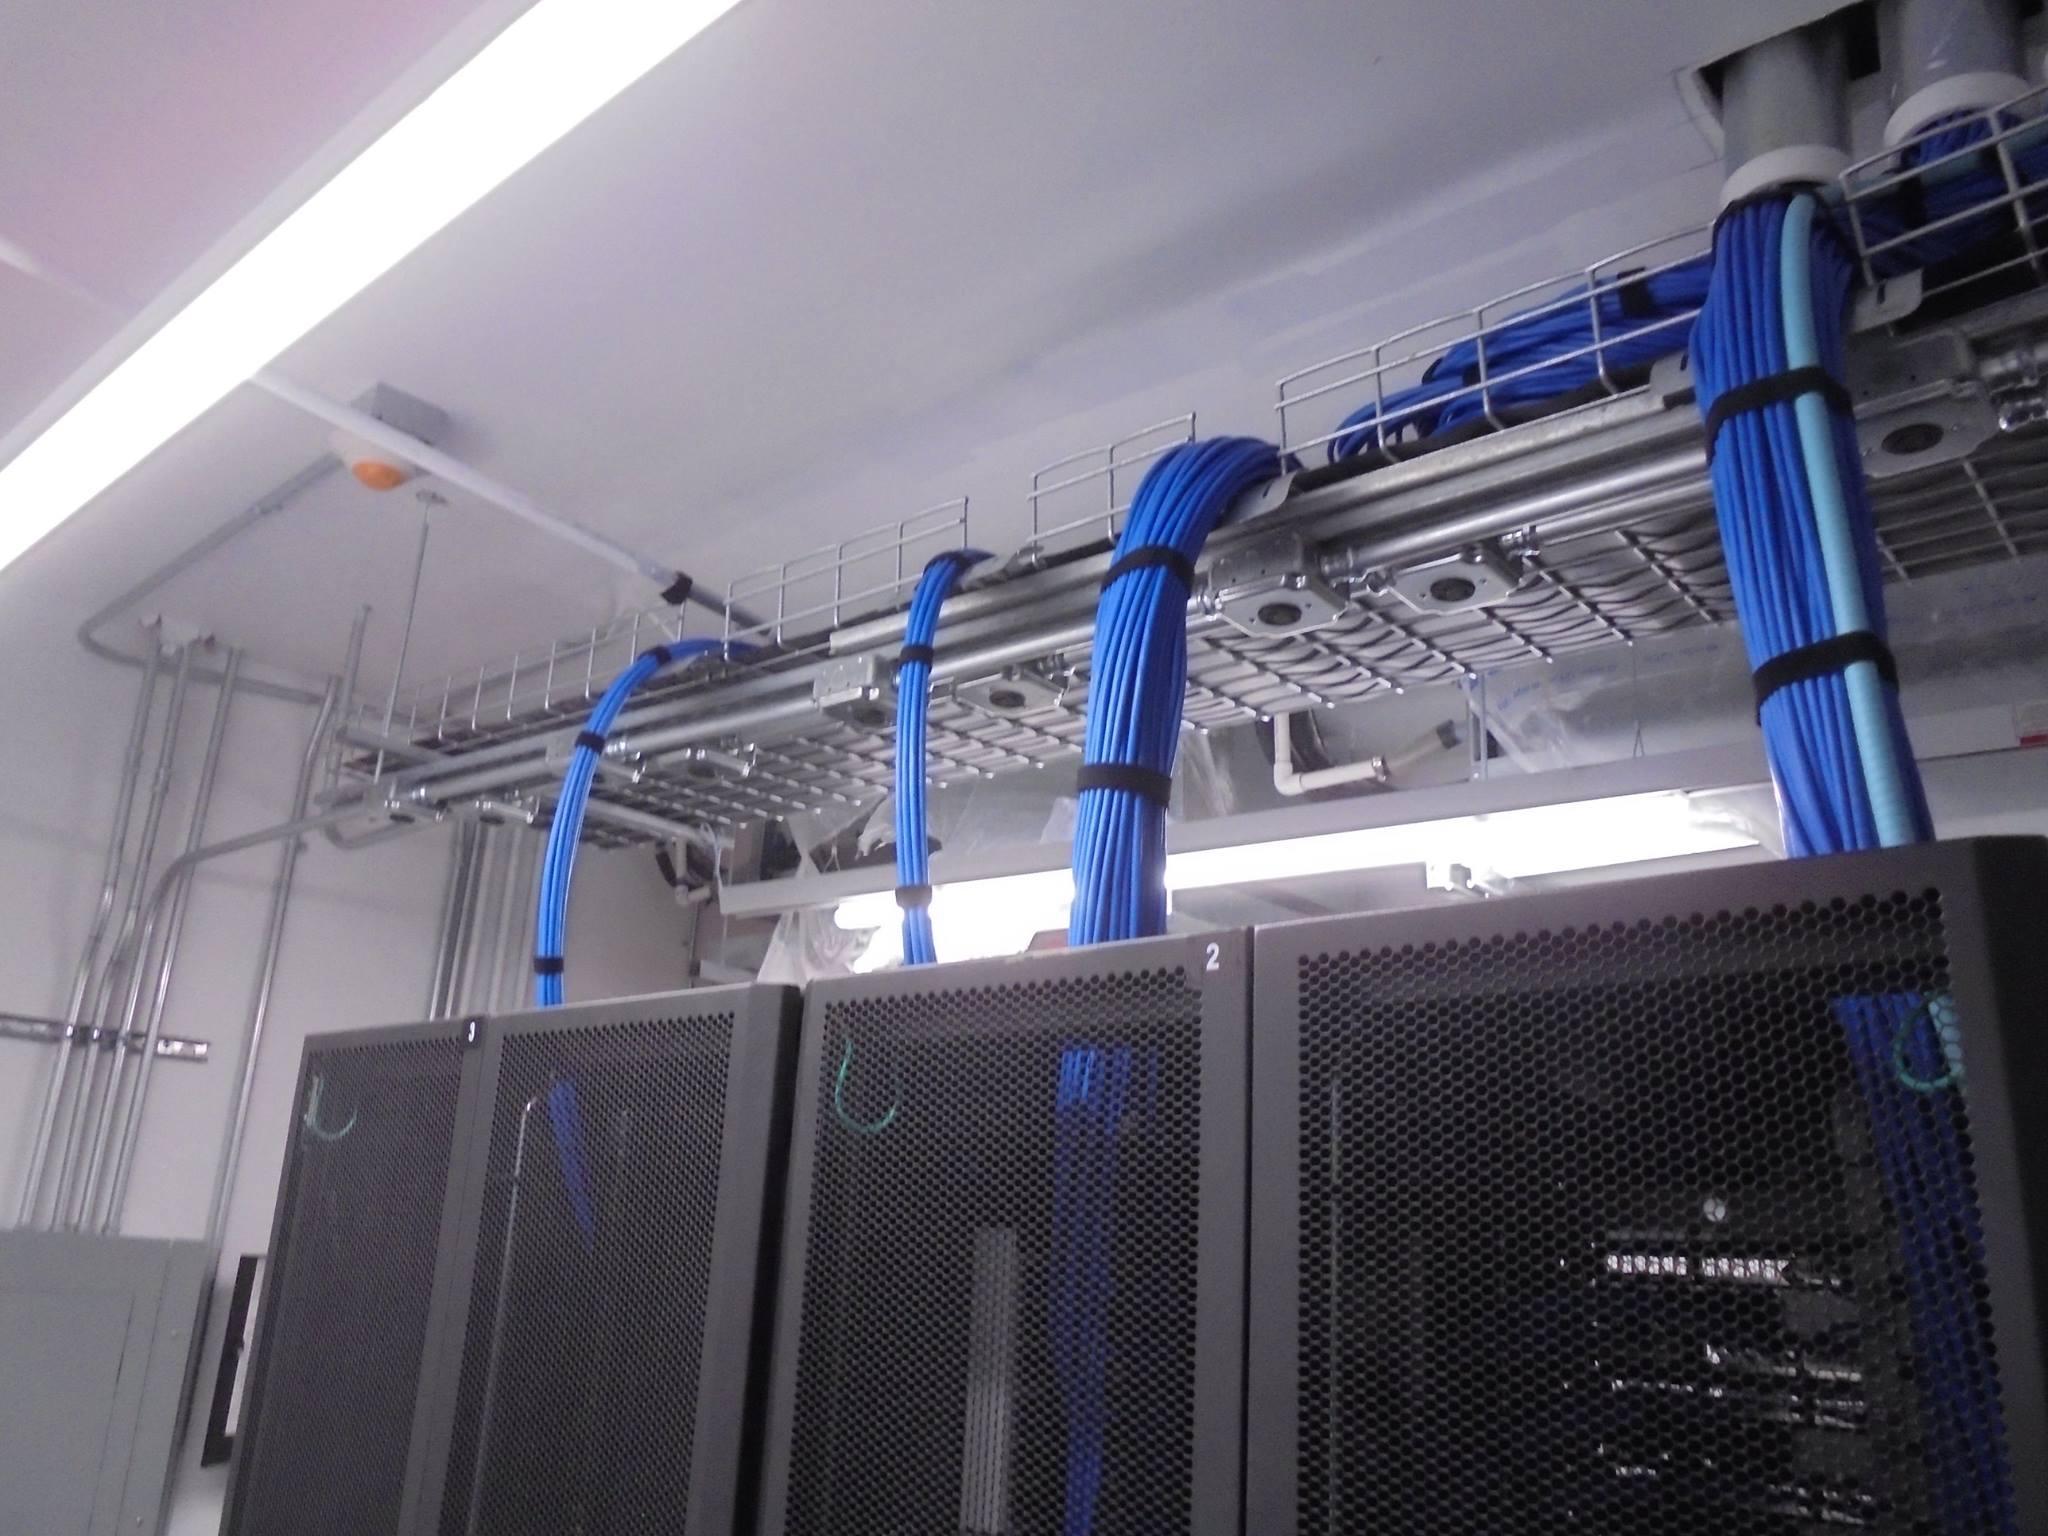 Network 3